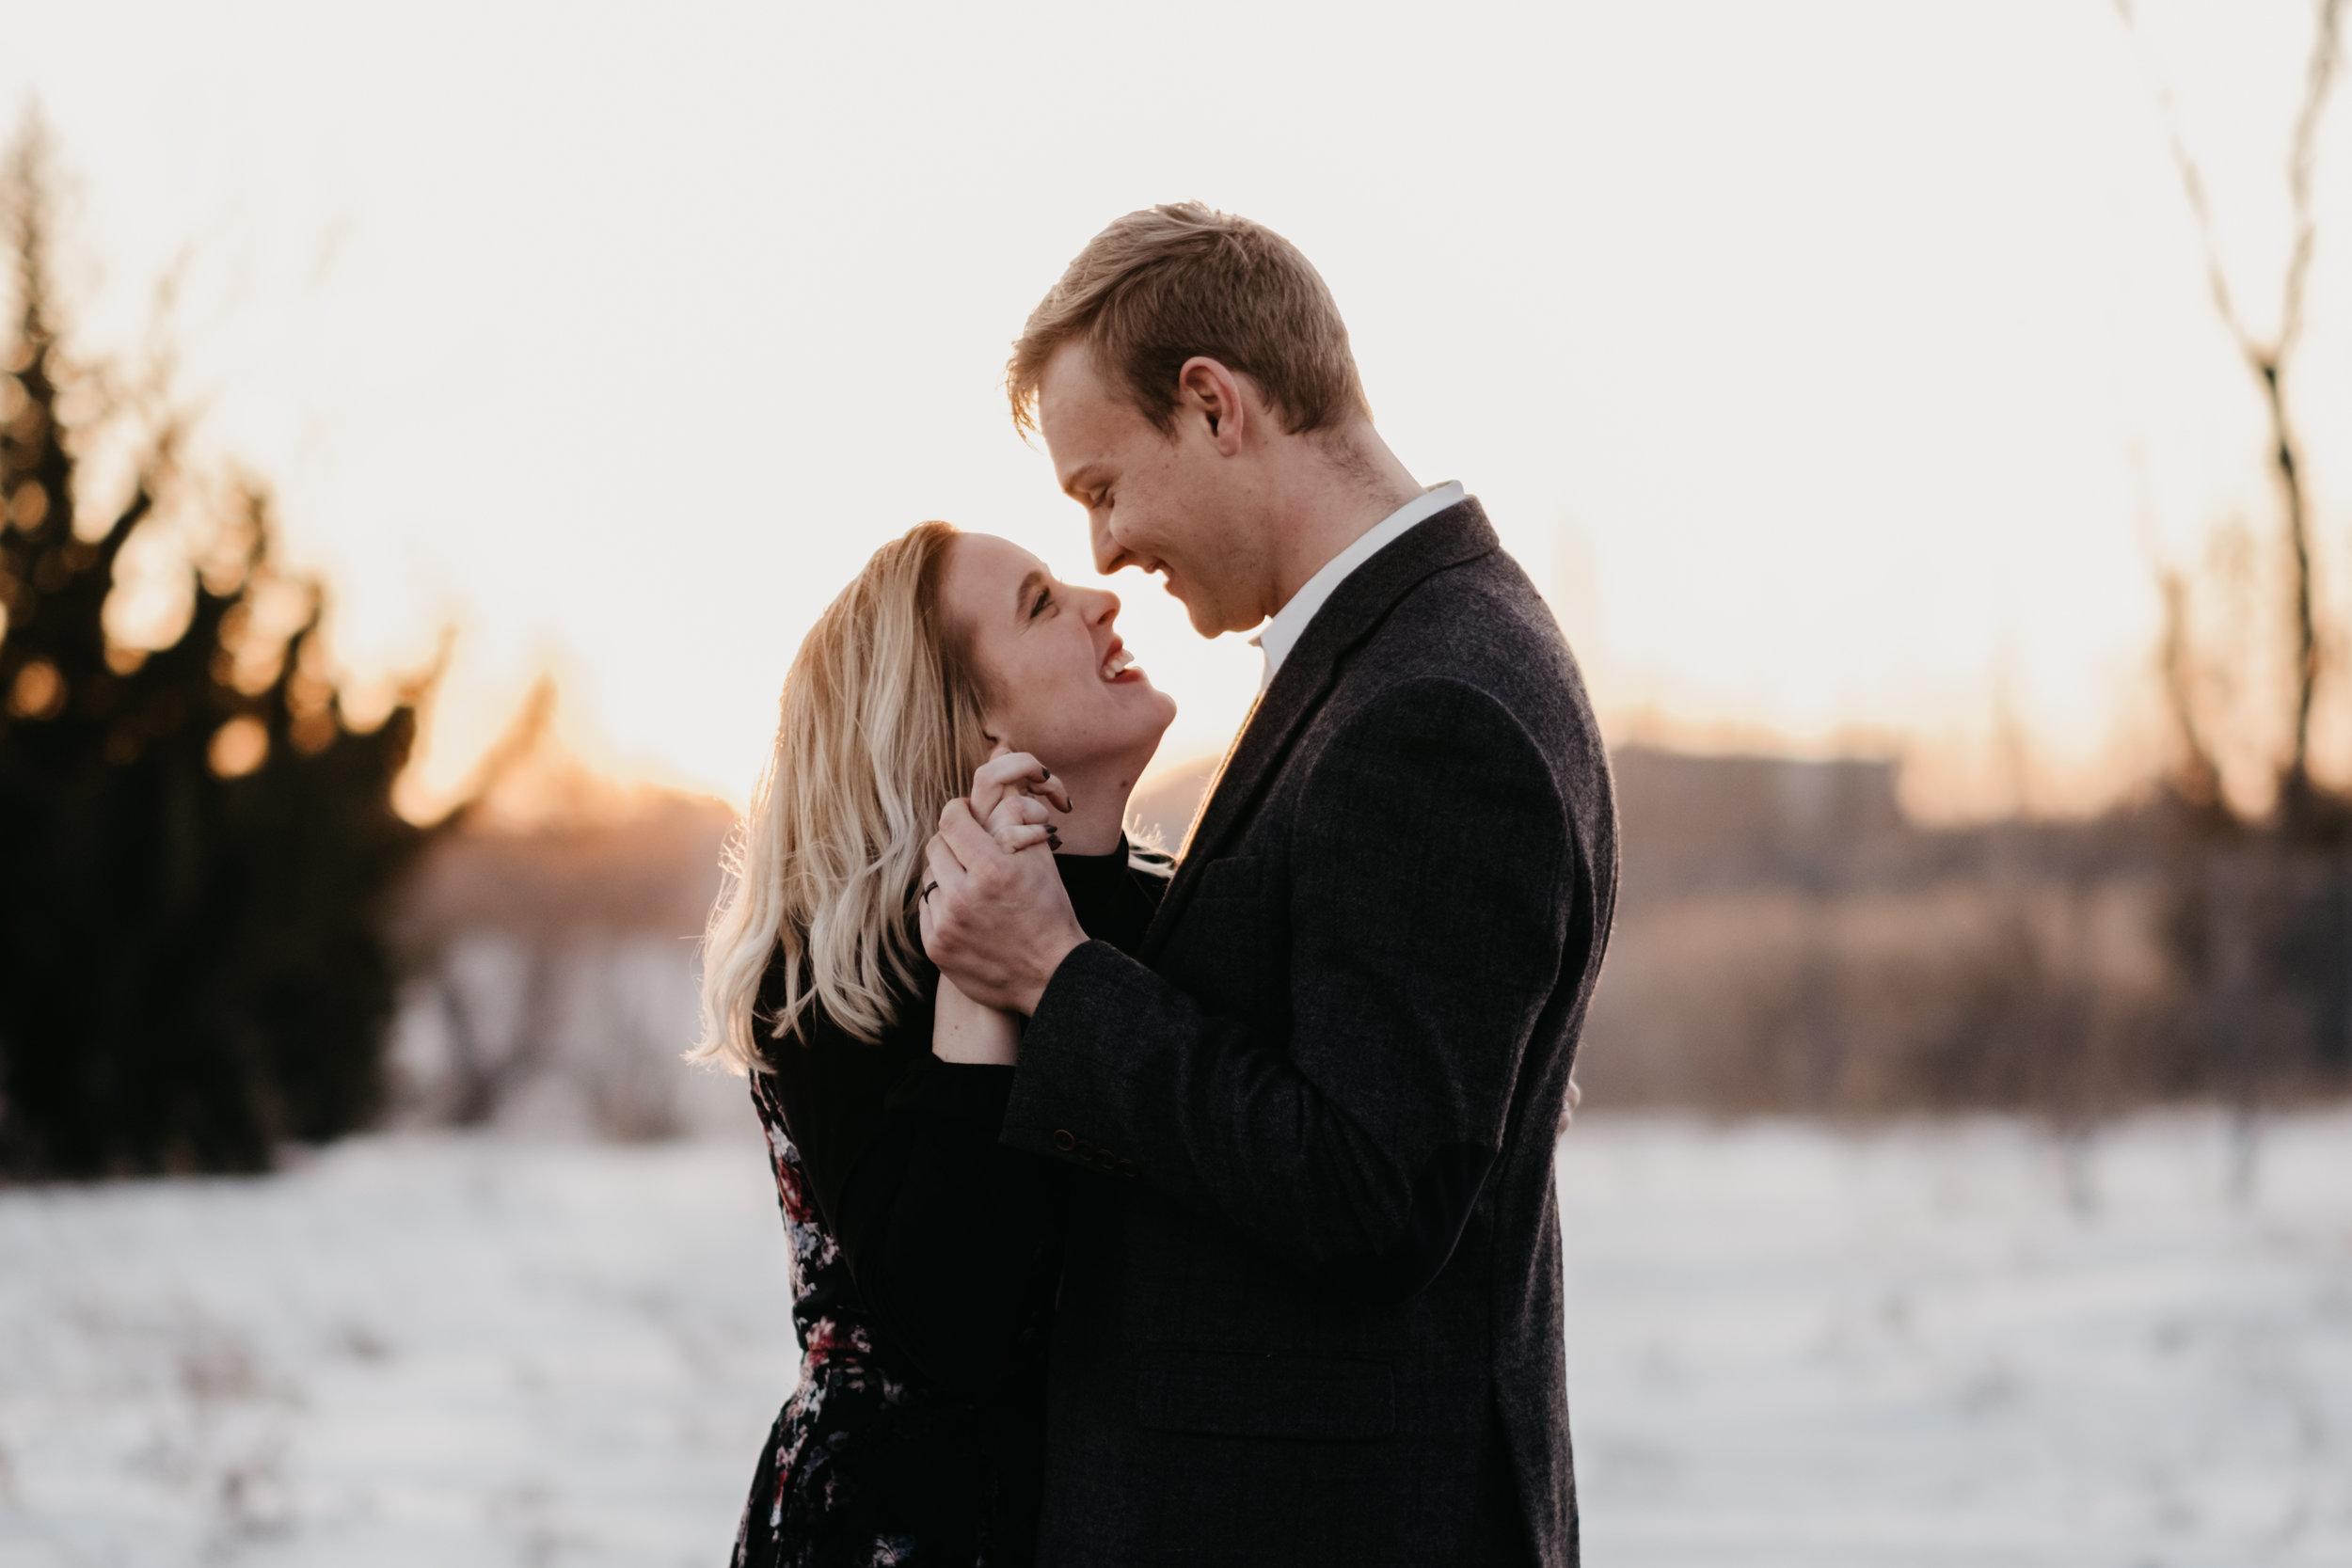 Talia + Brendan | Engagement Photography | Sioux Falls, South Dakota Photographer-143.jpg